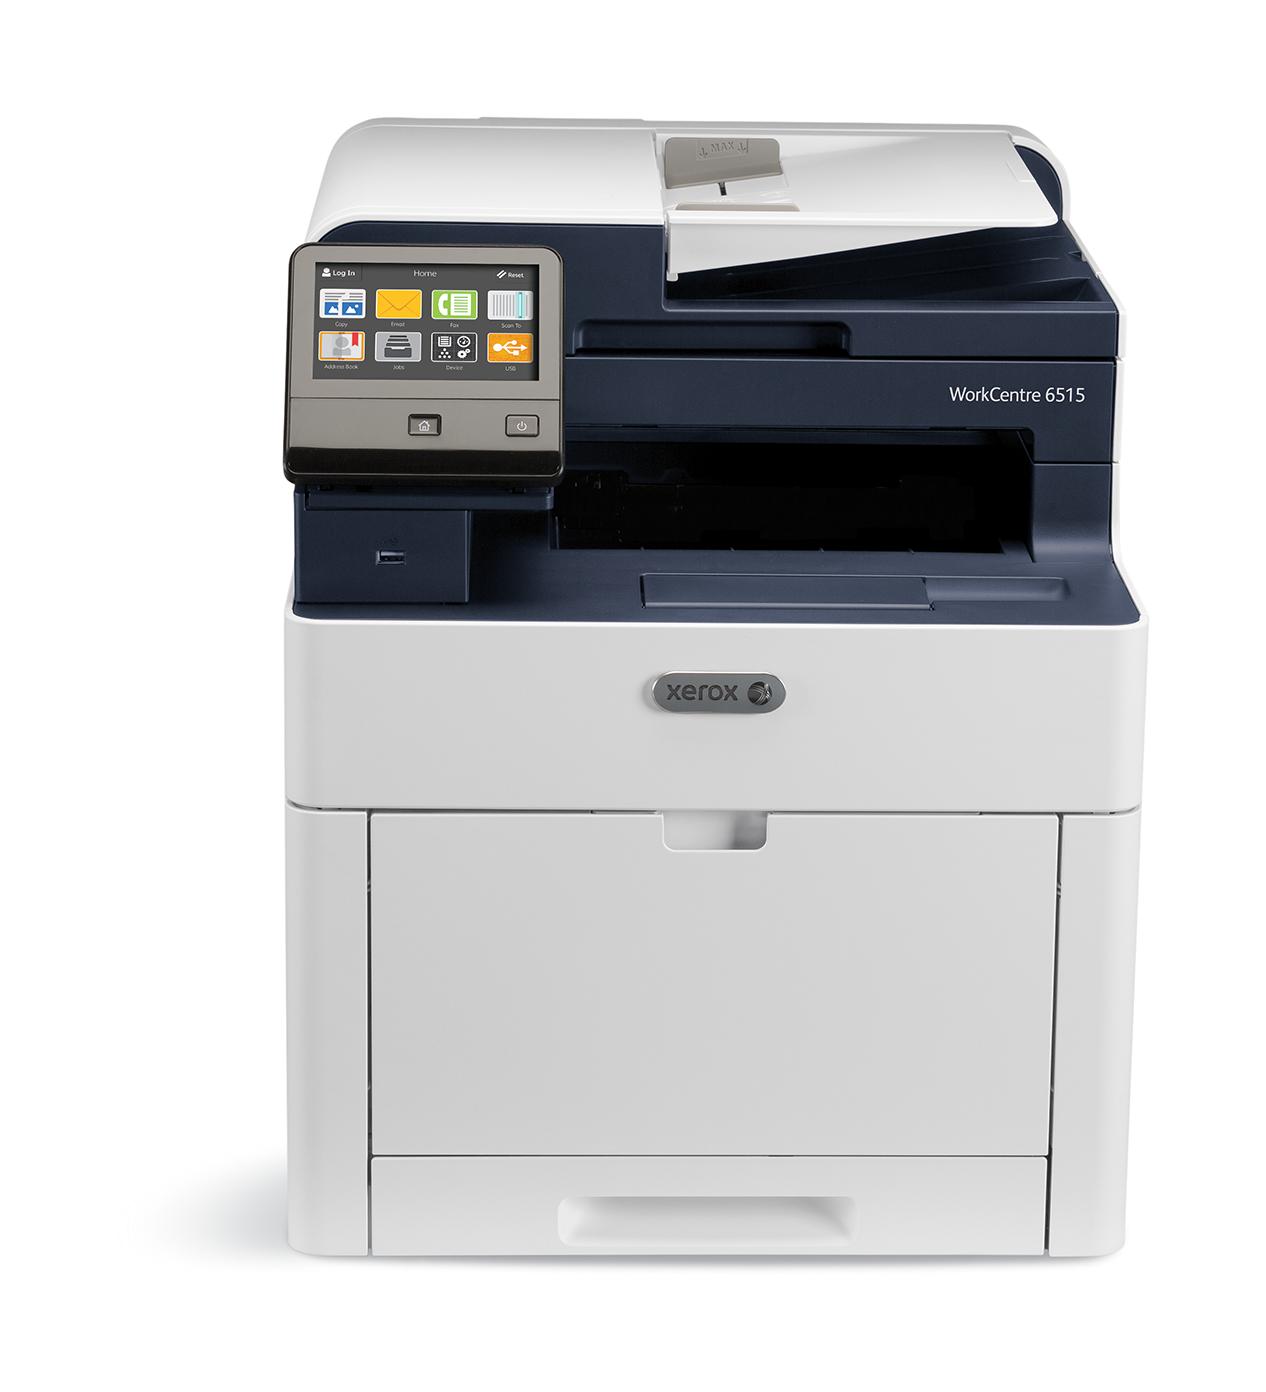 Multifunction Colour Laser Printer Workcentre 6515 Xerox